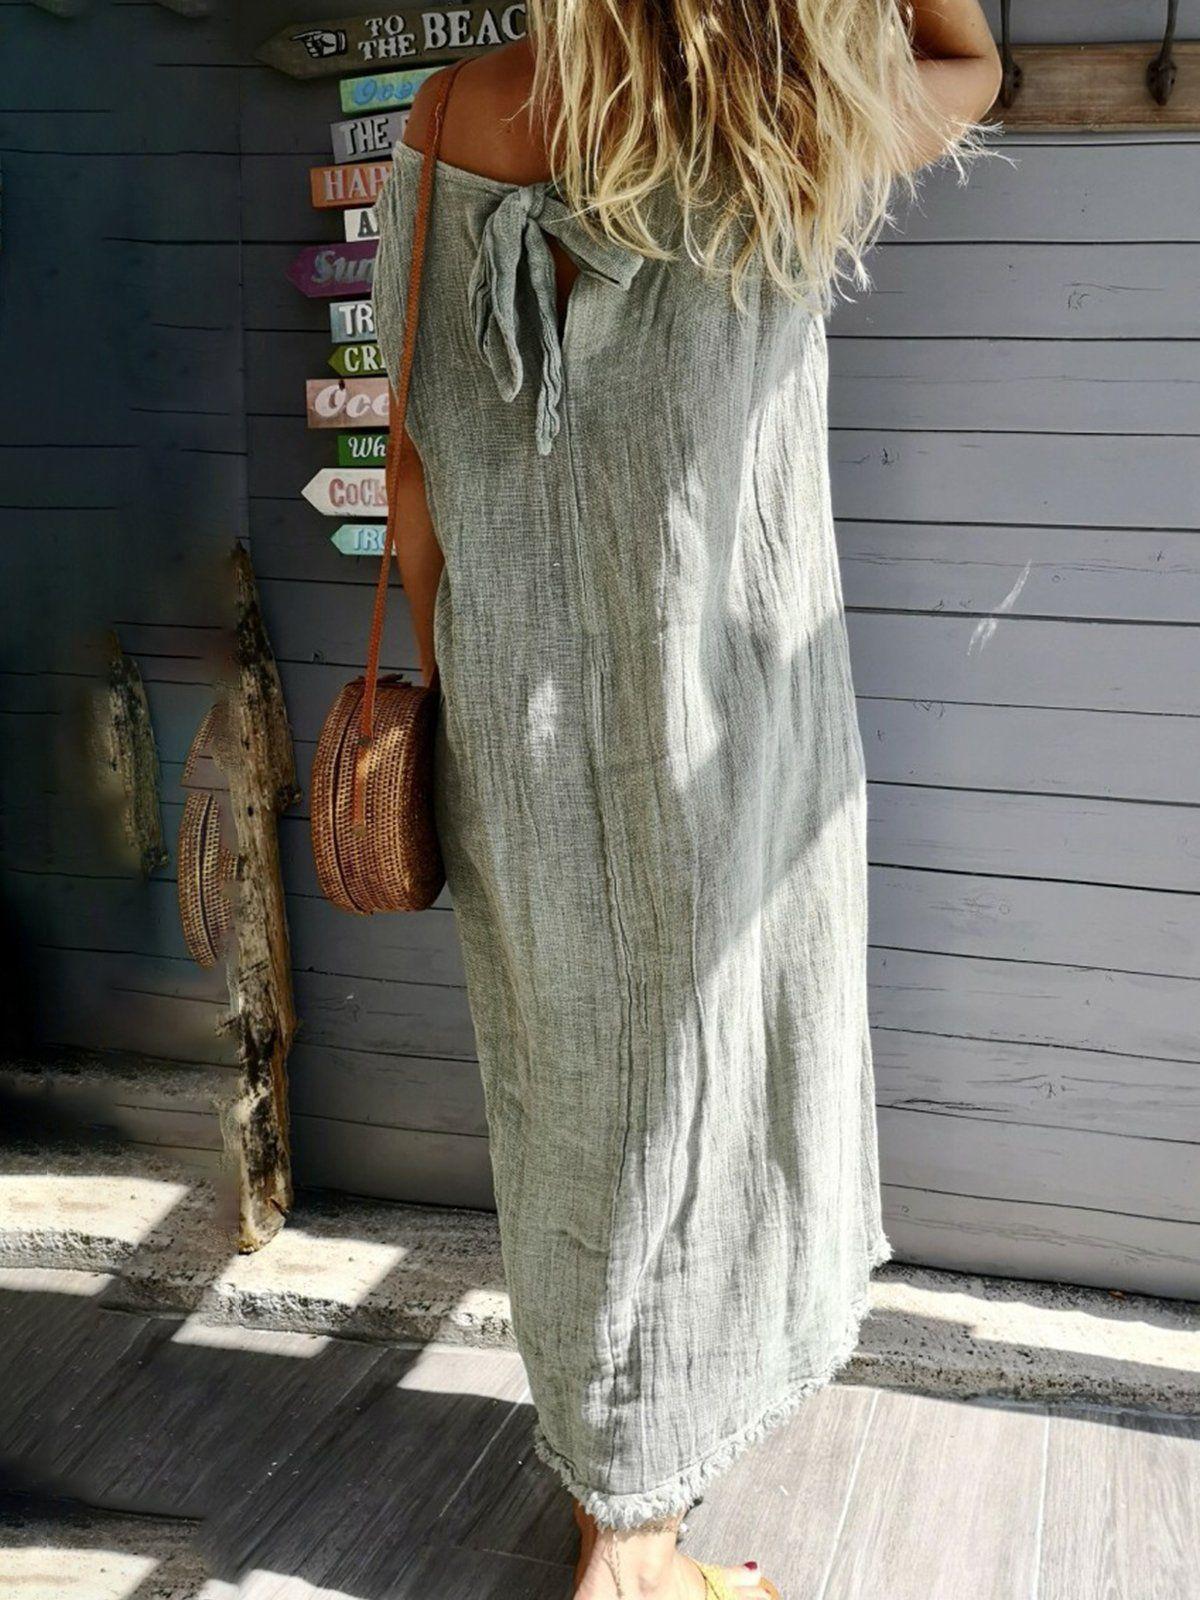 94ddac5e7 Buy Shirt Dress Summer Dresses For Women at zoesweet. Online Shopping  zoesweet Summer Dresses 1